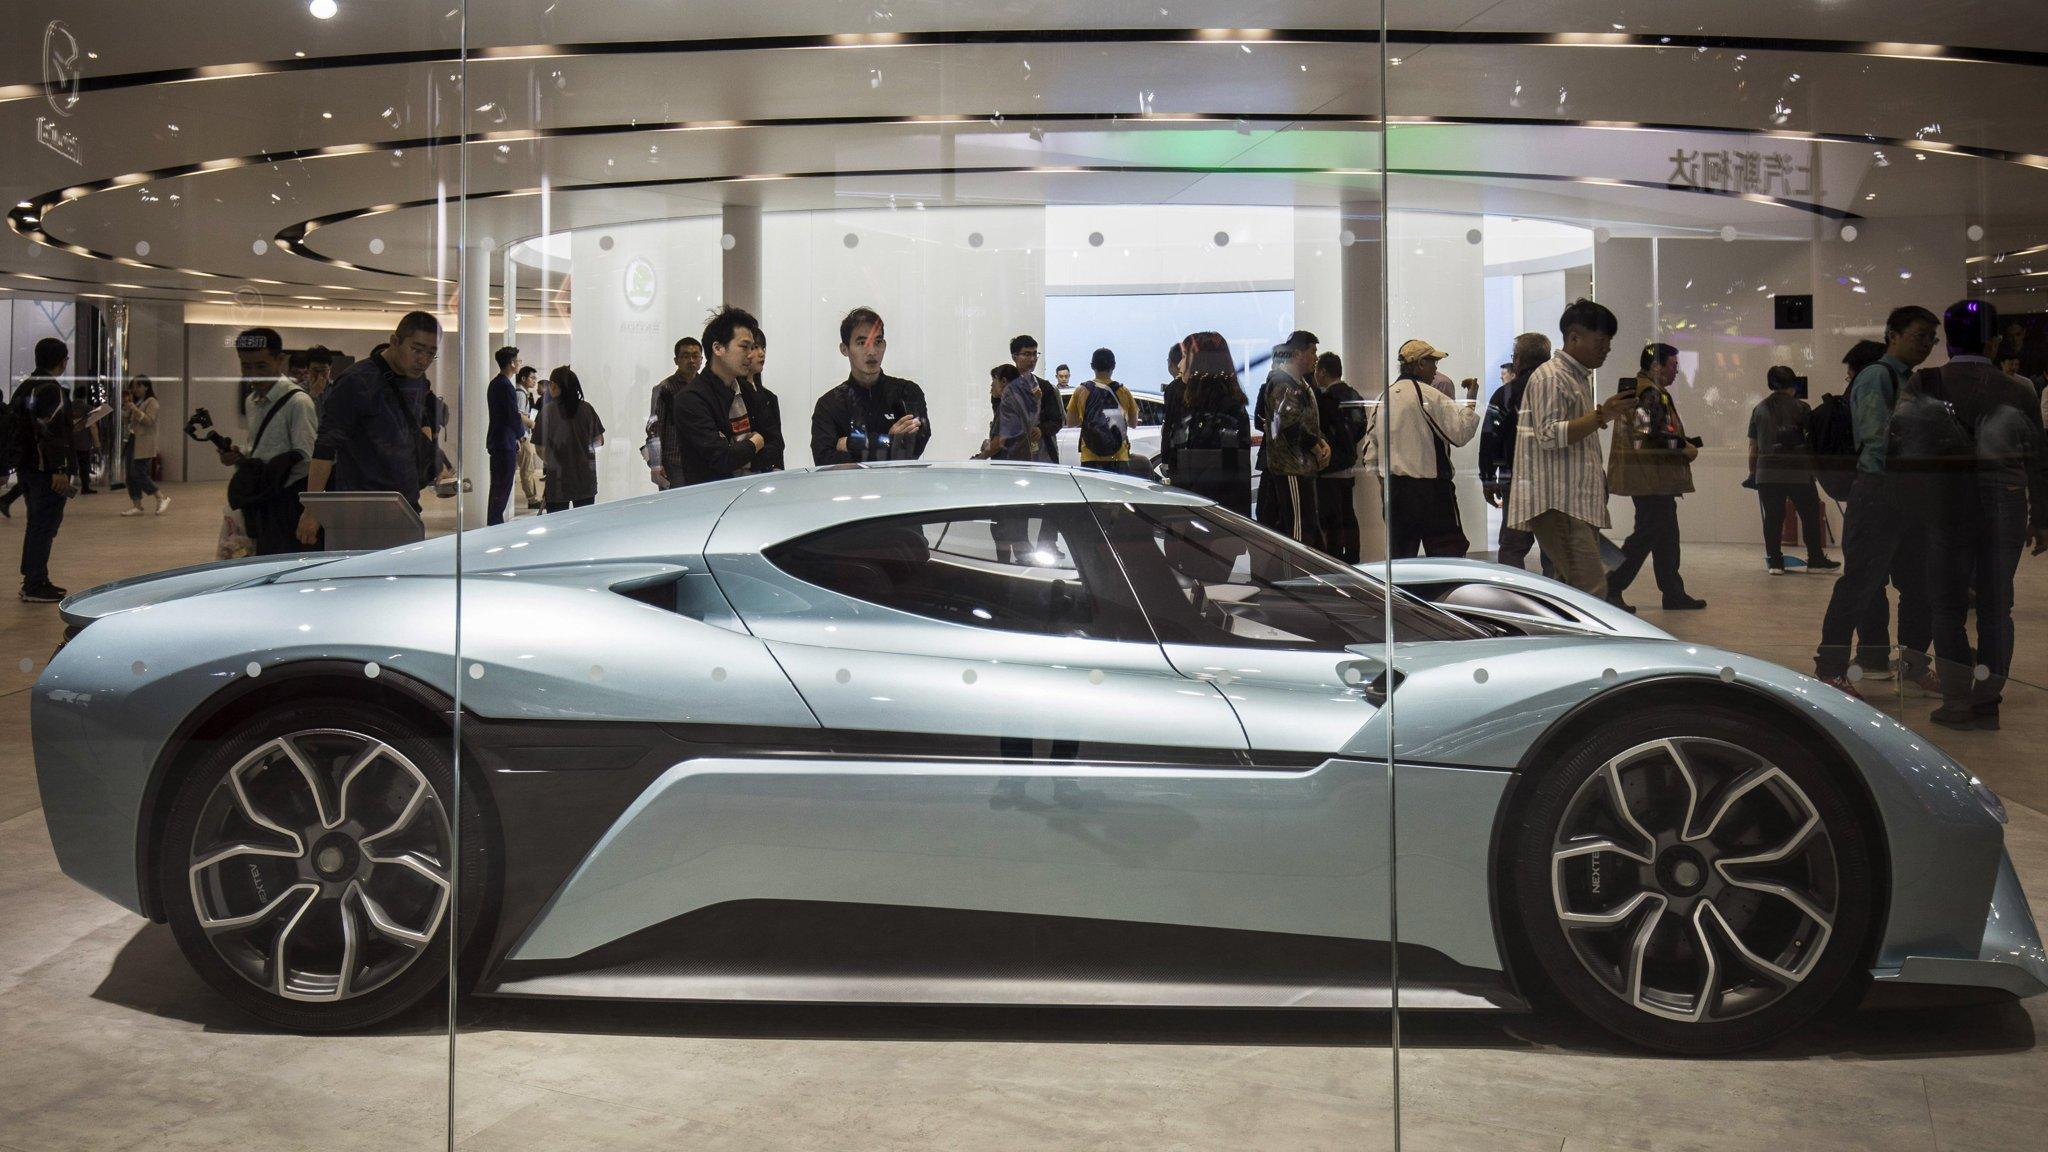 Bankruptcies and slowdown hang over China's electric car